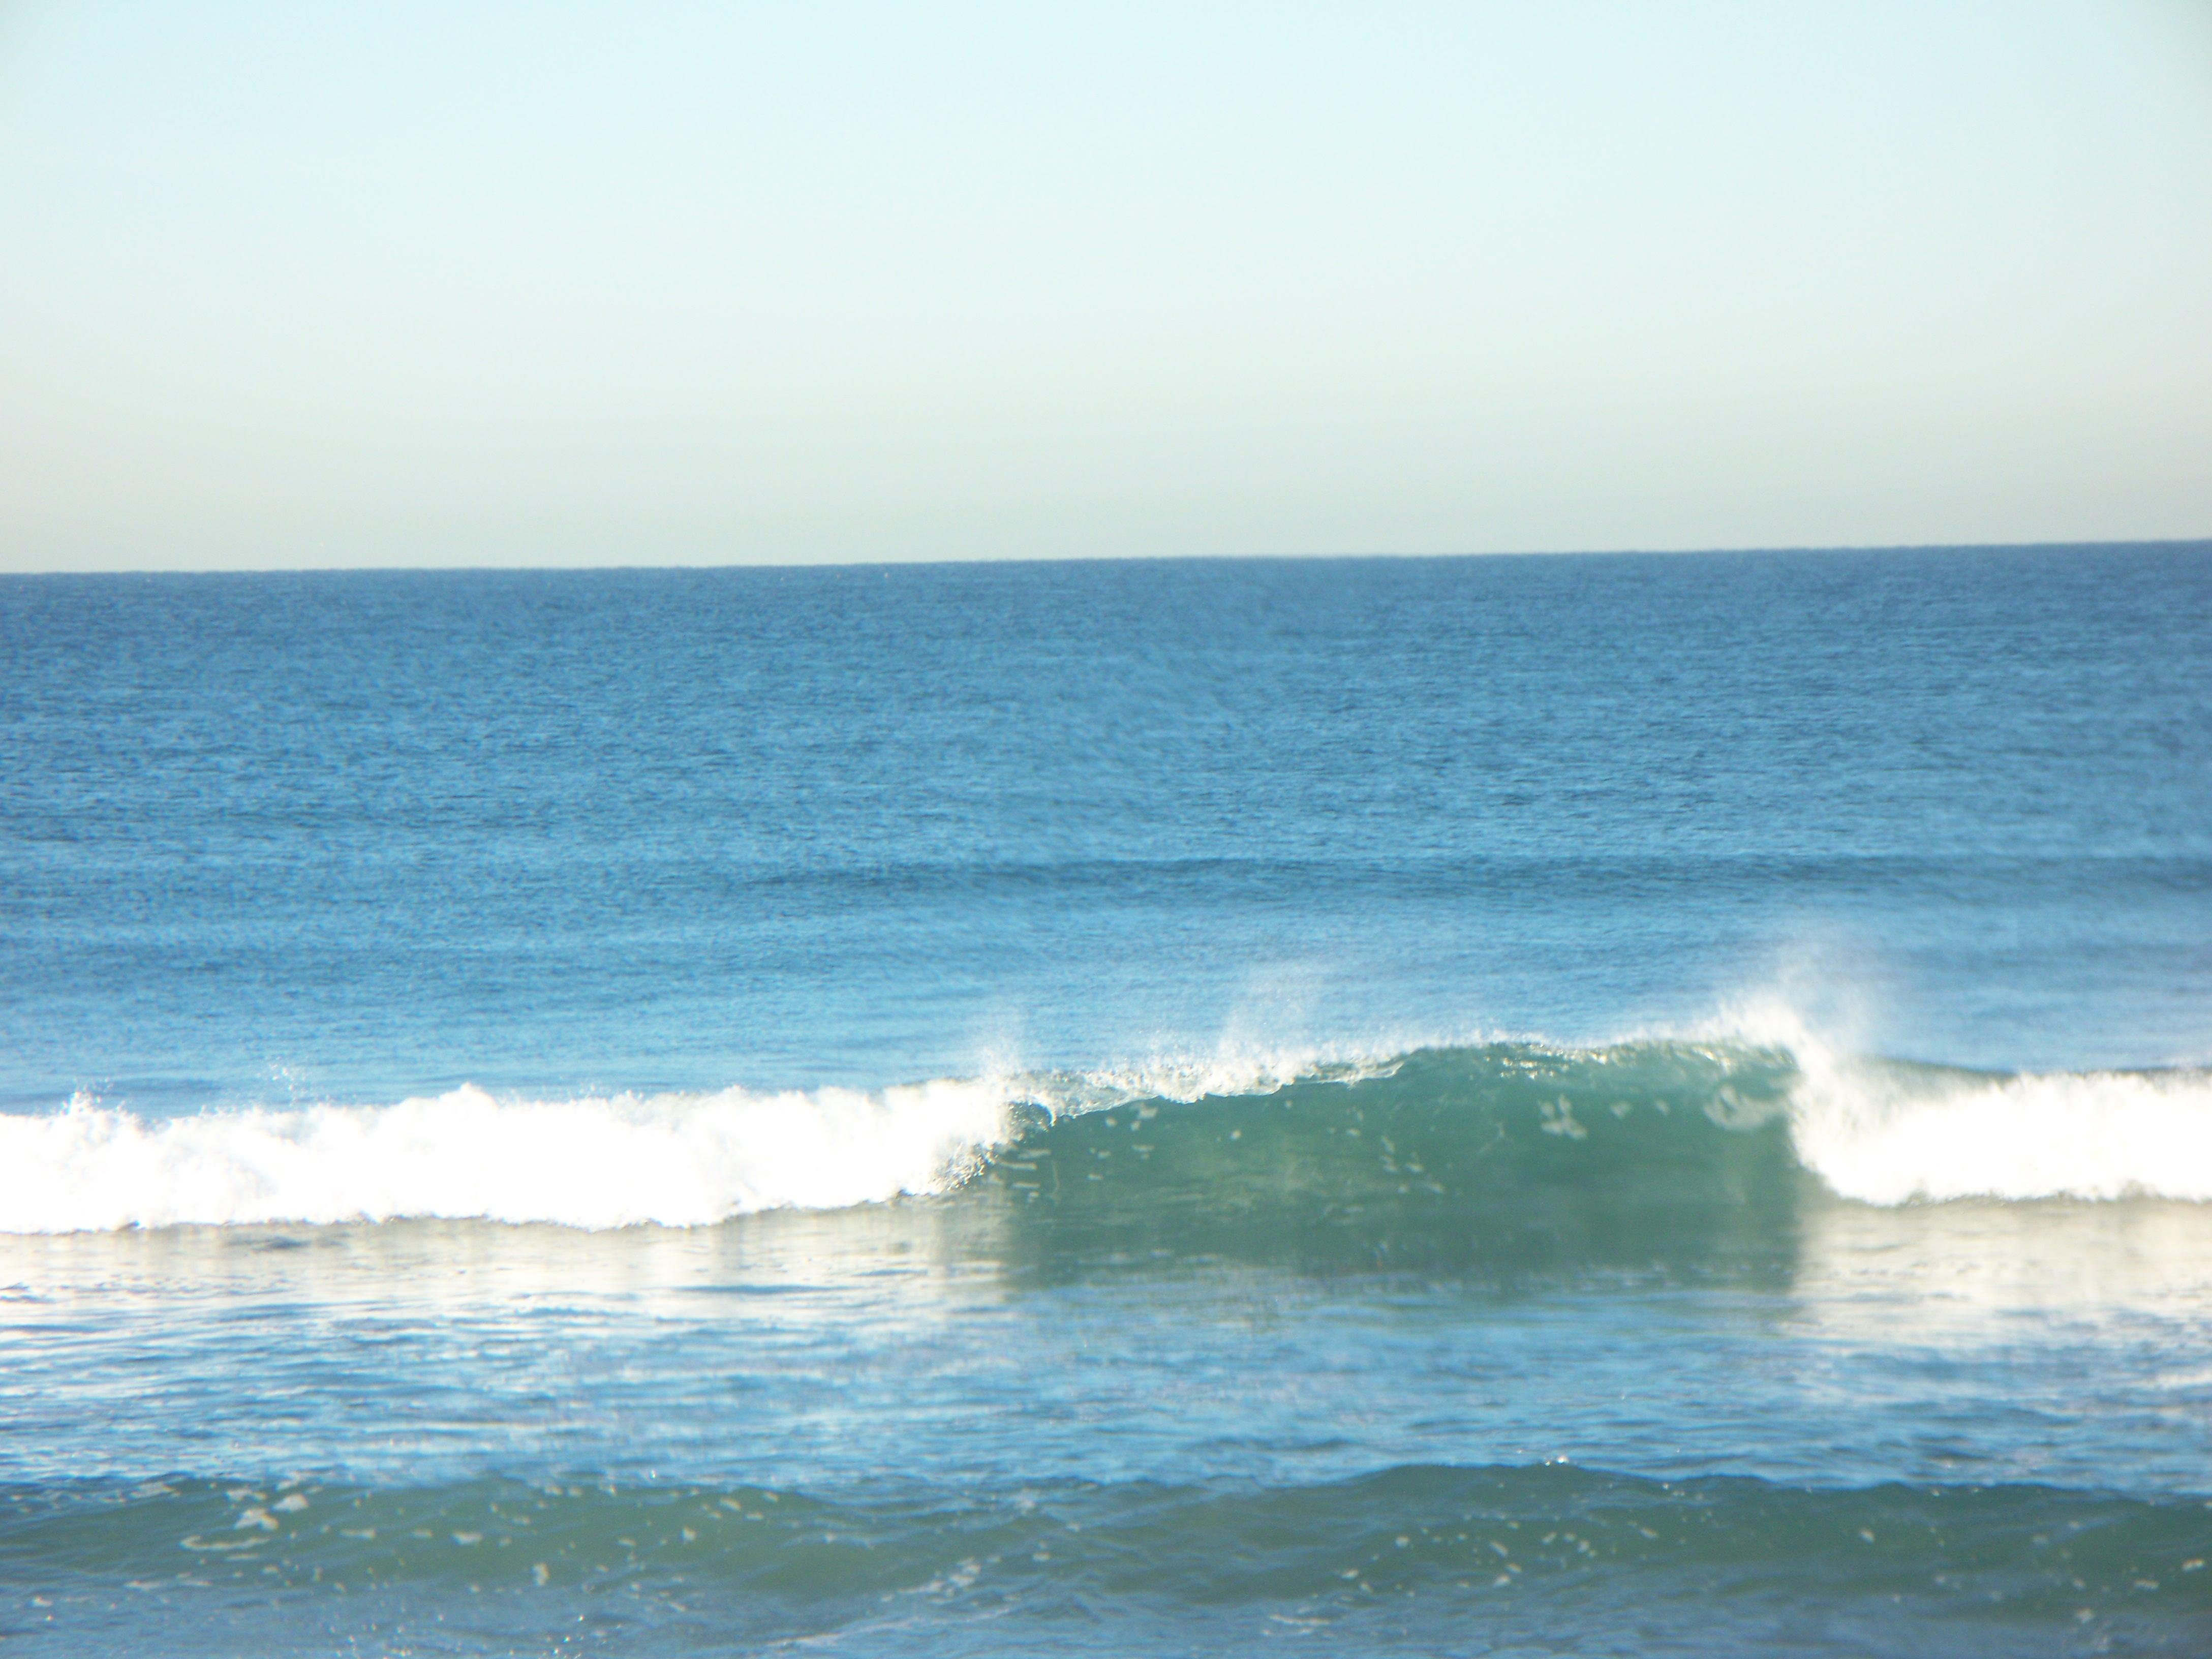 Fall season surf at Torrey Pines State Beach